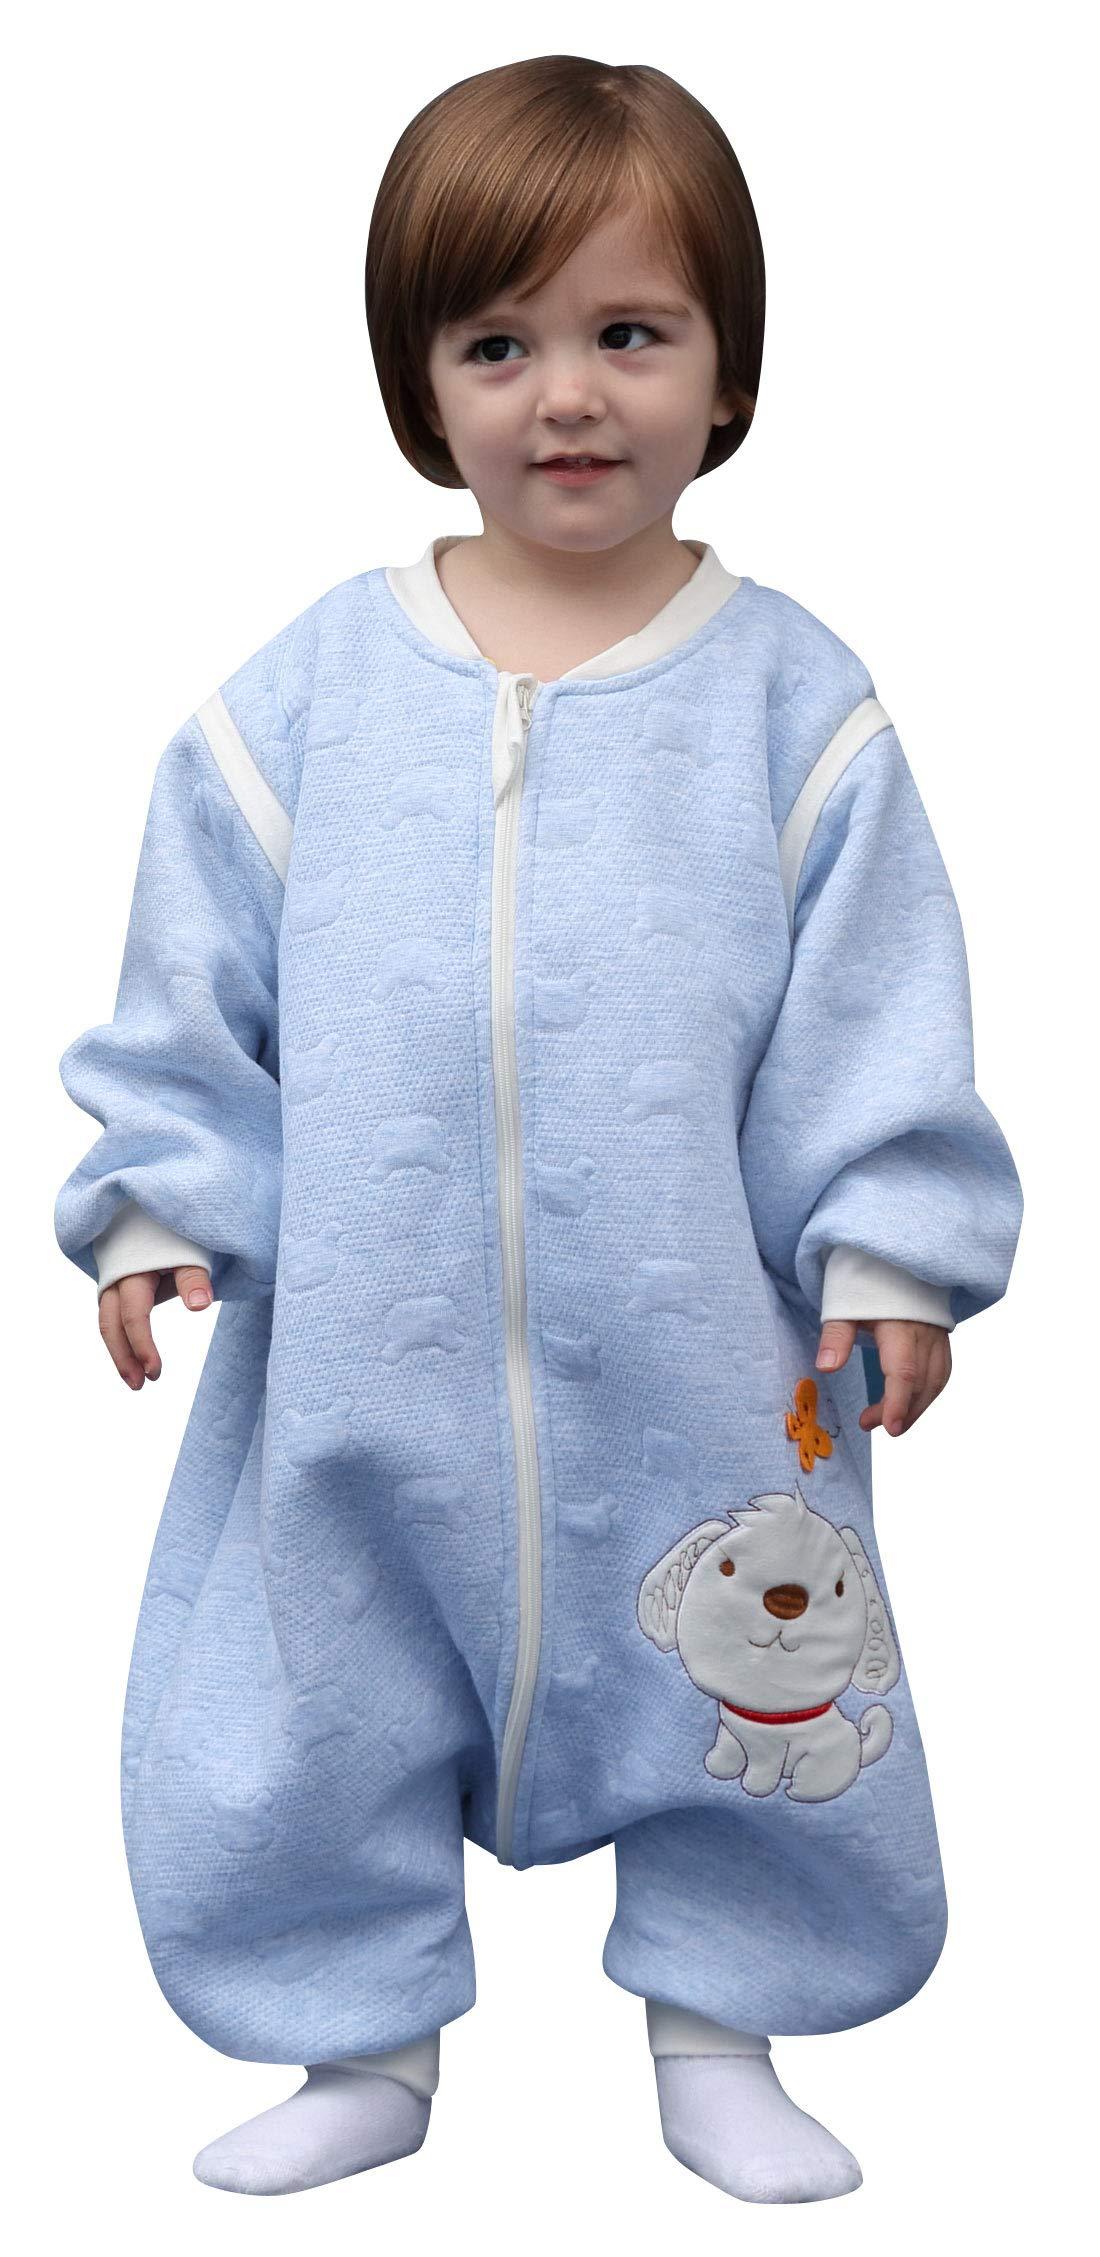 Happy Cherry - Mono Saco de dormir para Bebés Niños Niñas con Manga Larga Desmontable Mameluco